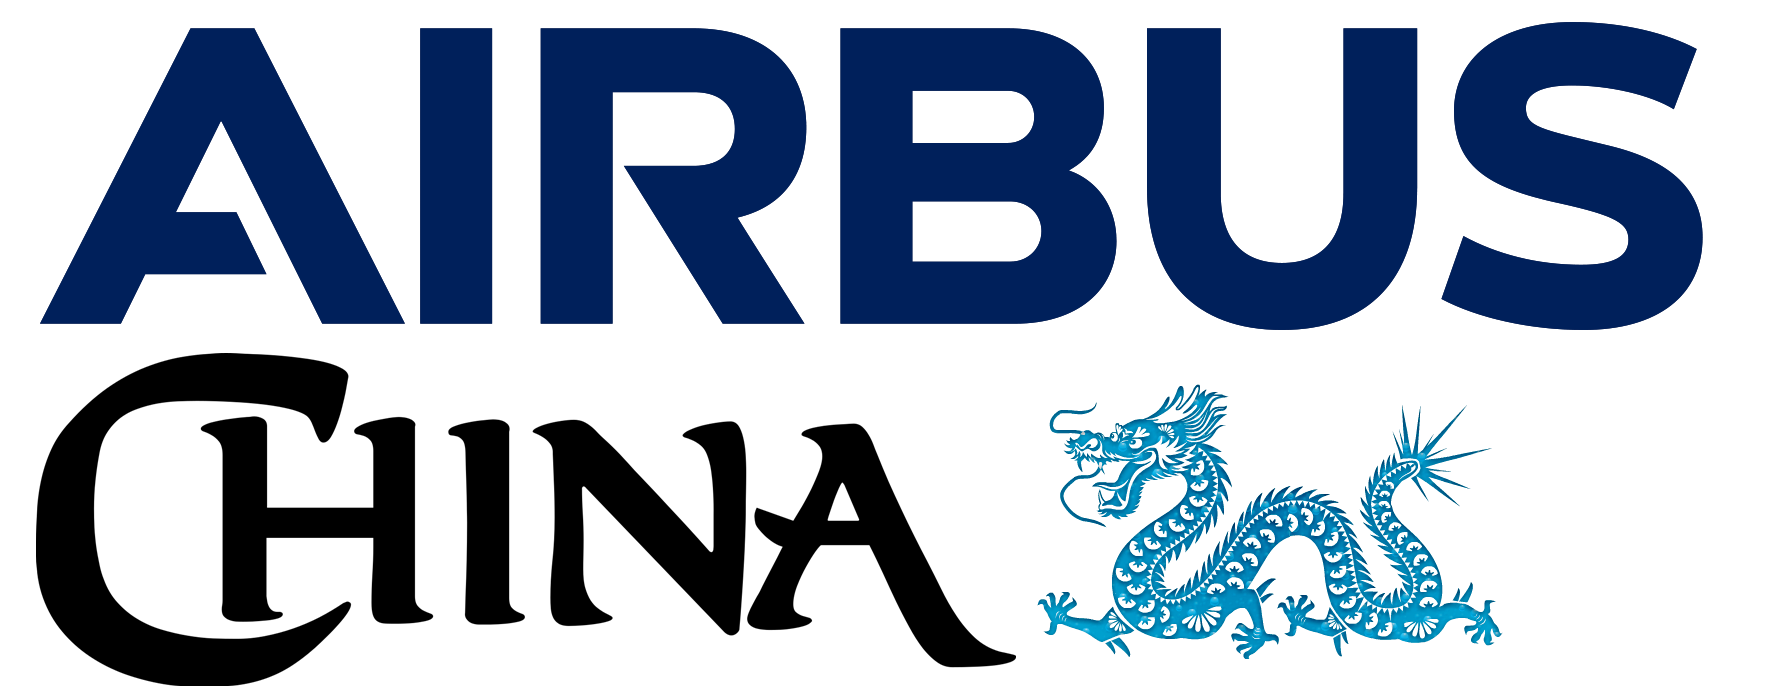 AW-Airbus_logo_Tianjin